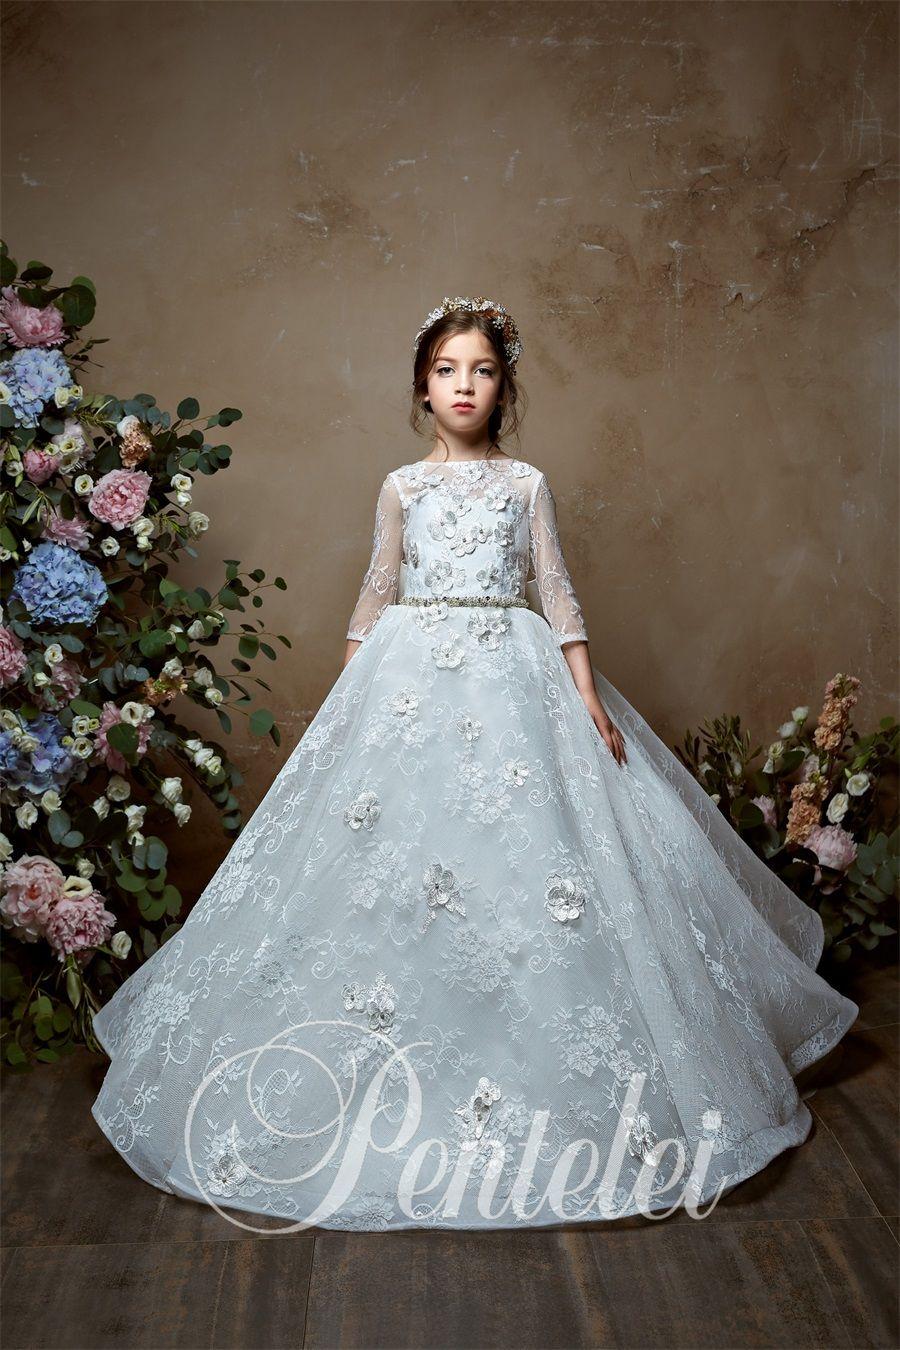 vestidos de primera comunion 2019 pentelei 2338 Lace Kids First Communion Dresses for Little Girls Long Cute Flower Girl Dress